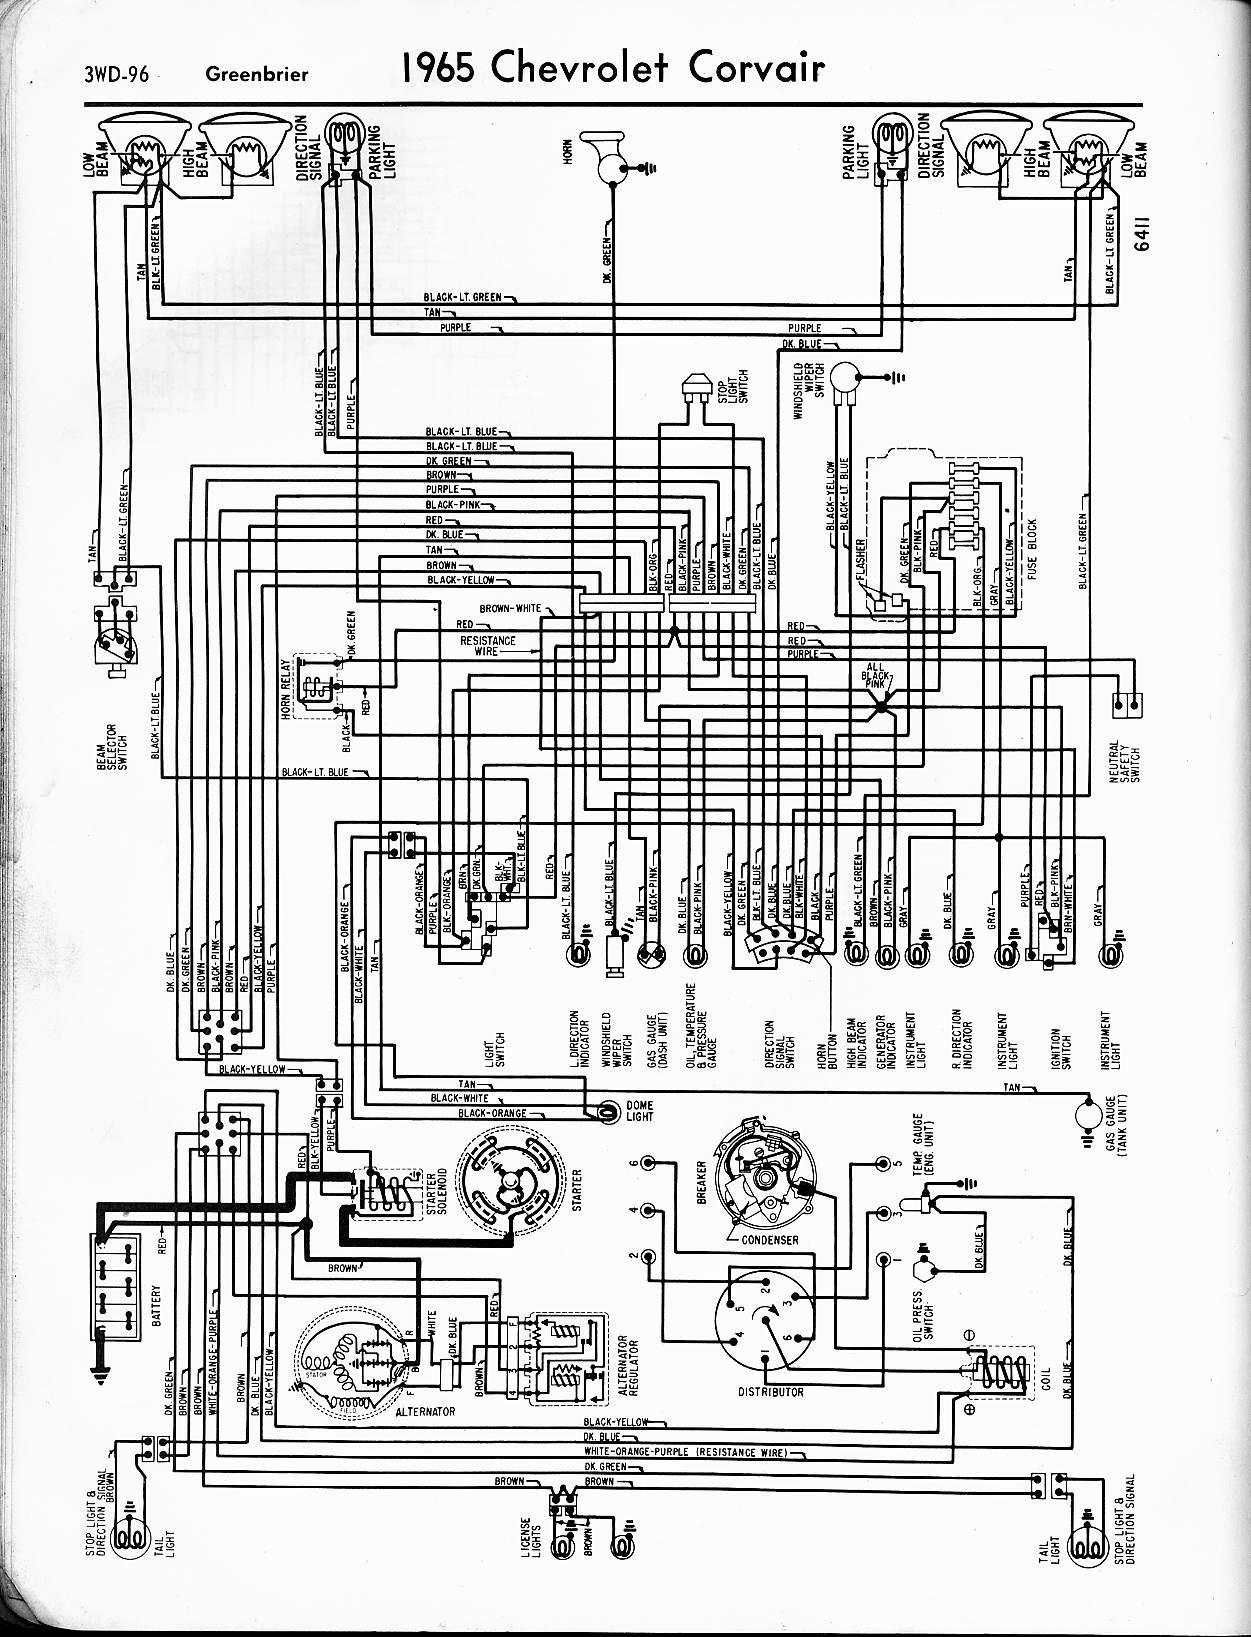 Diagram 68 Impala Wiring Diagram Full Version Hd Quality Wiring Diagram Diagramtheise Brunisport It